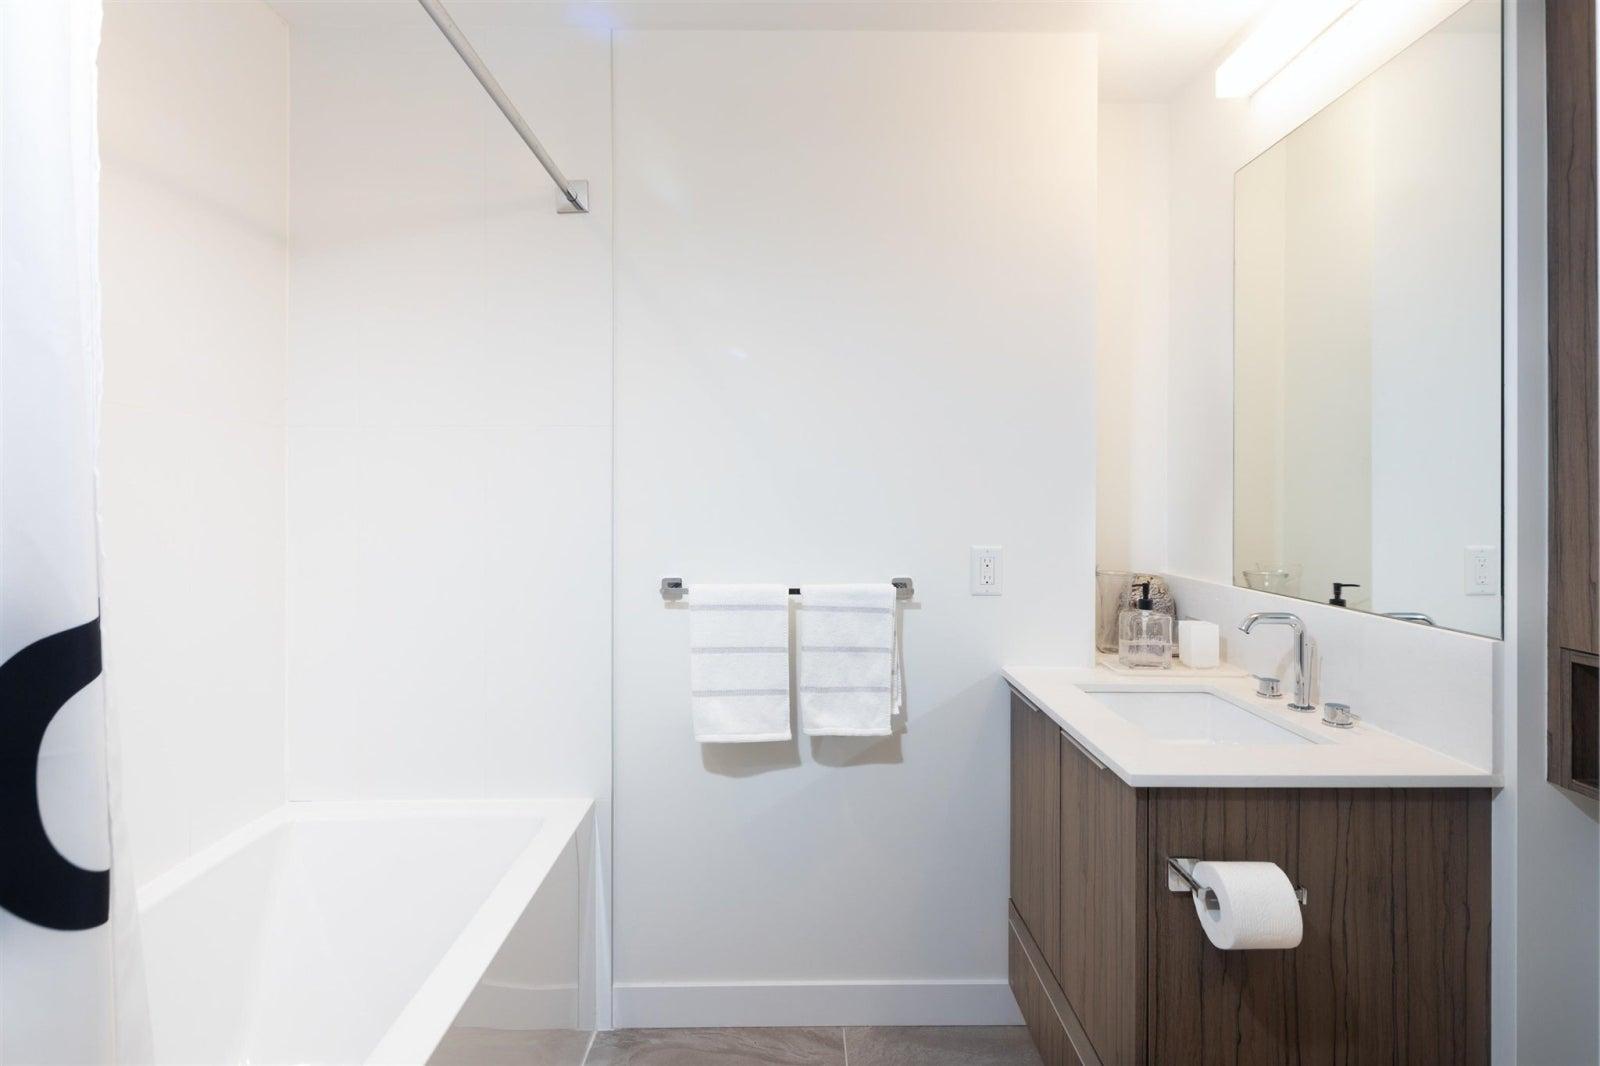 408 379 E BROADWAY AVENUE - Mount Pleasant VE Apartment/Condo for sale, 2 Bedrooms (R2599900) #16